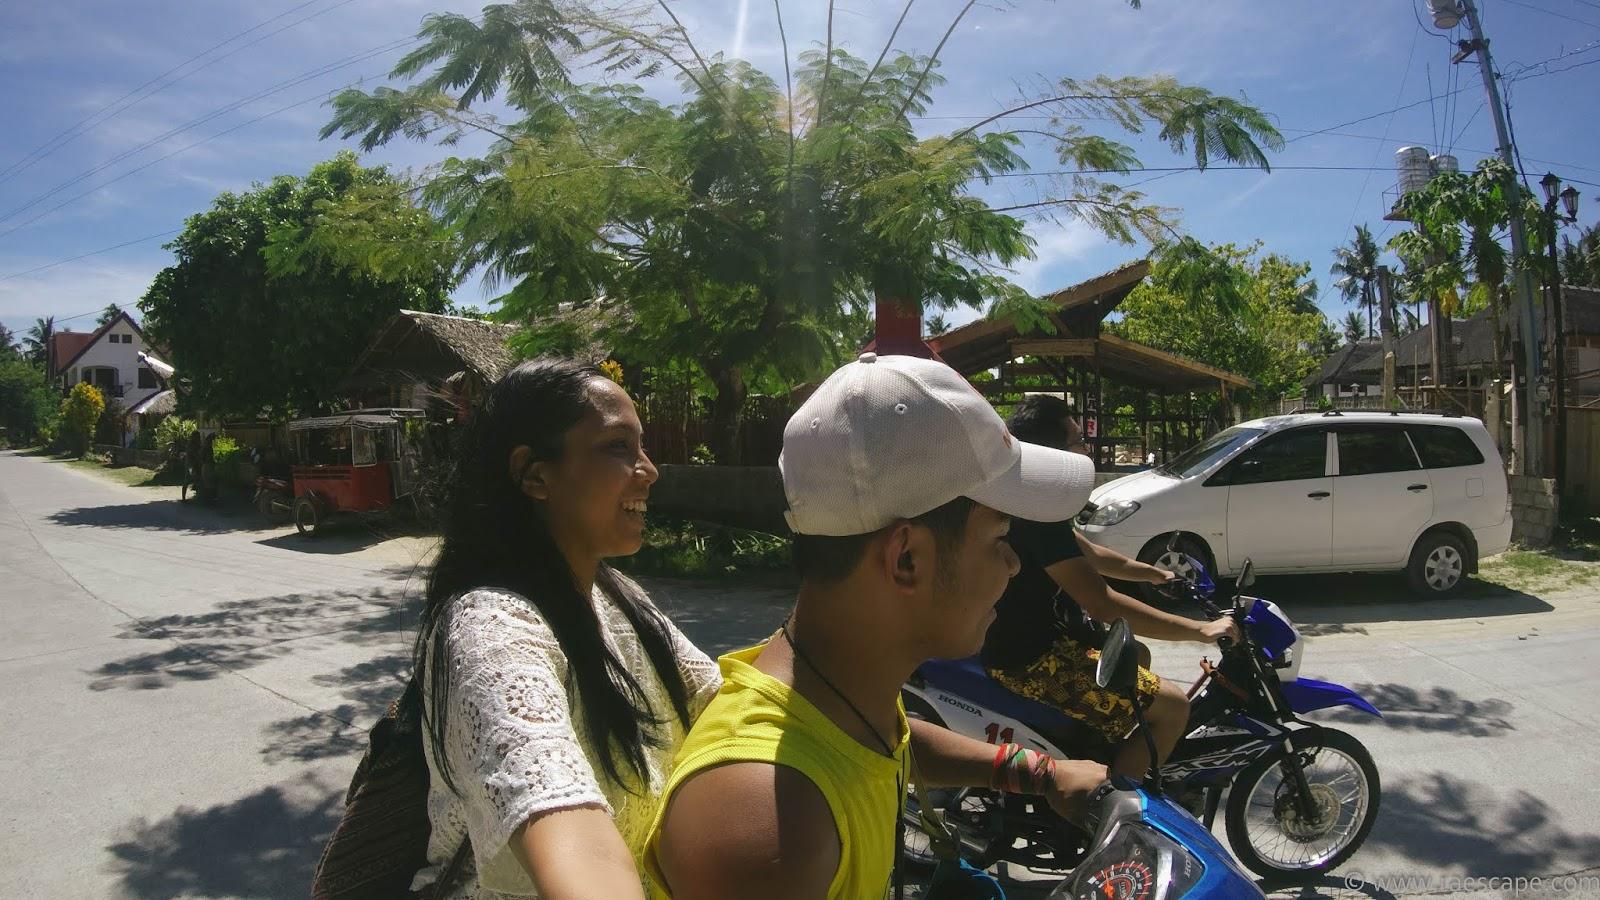 siargao island motorbike